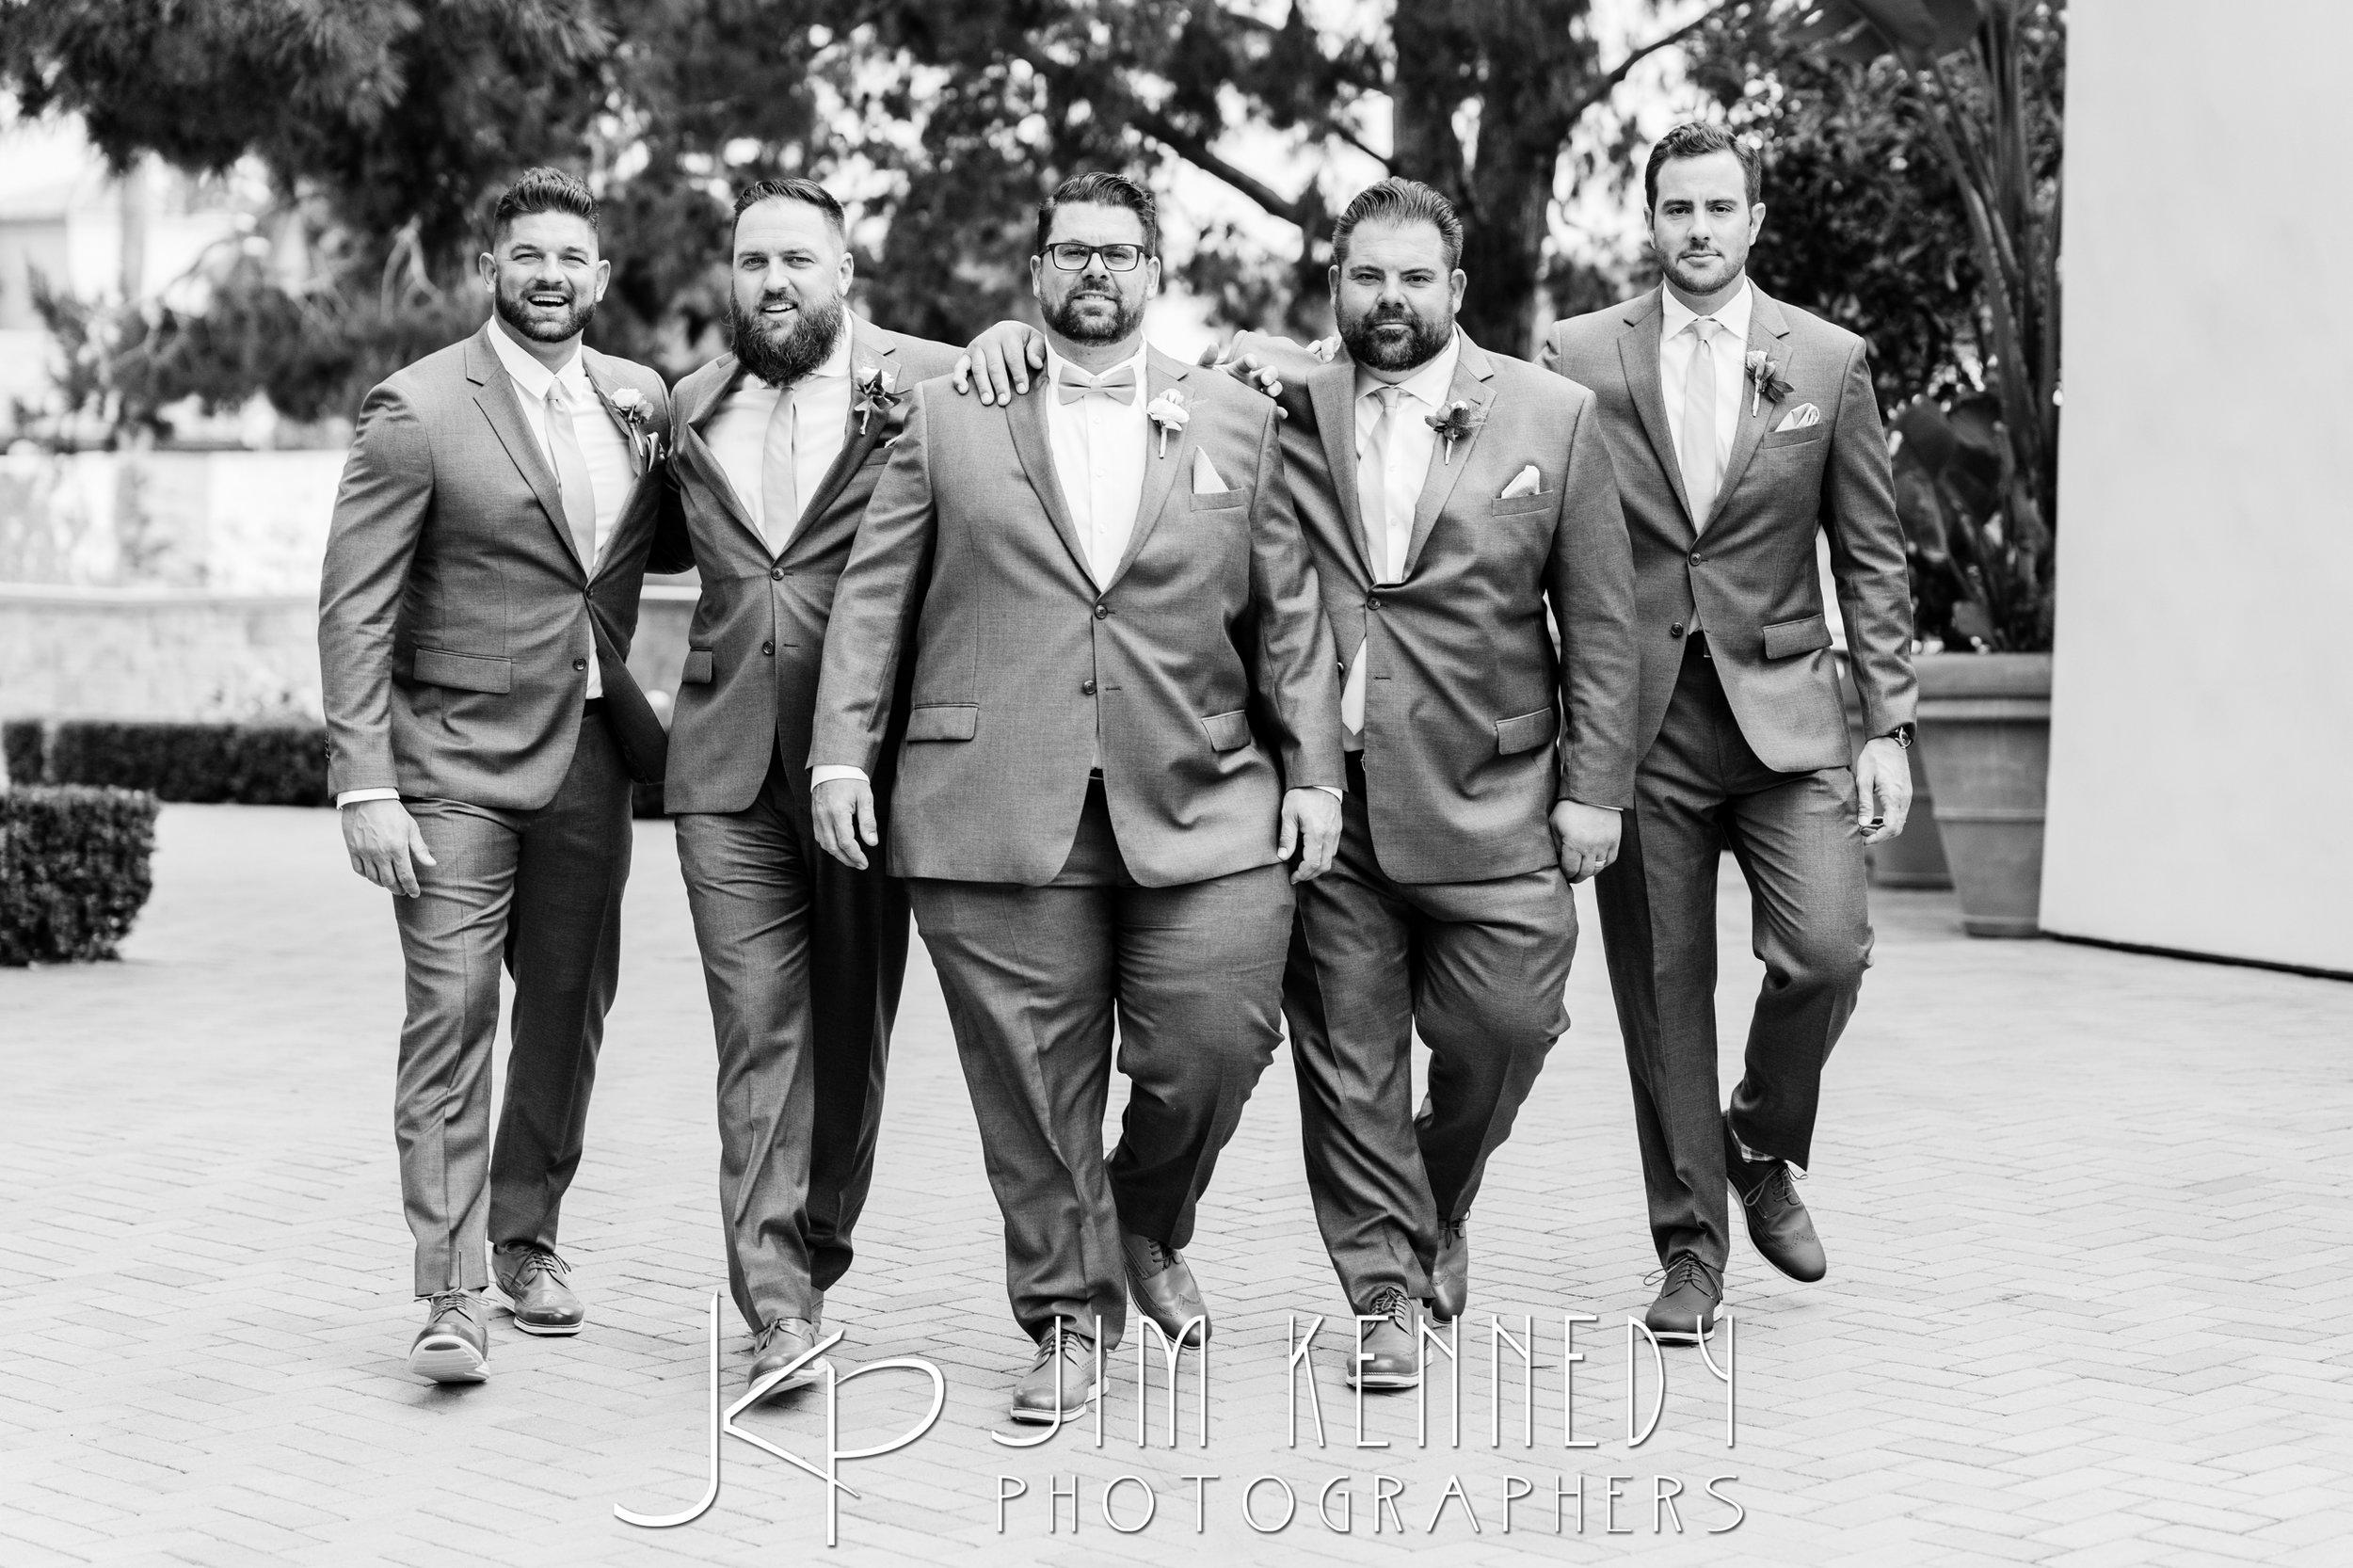 pelican-hill-wedding-jim-kenedy-photographers_0080.JPG